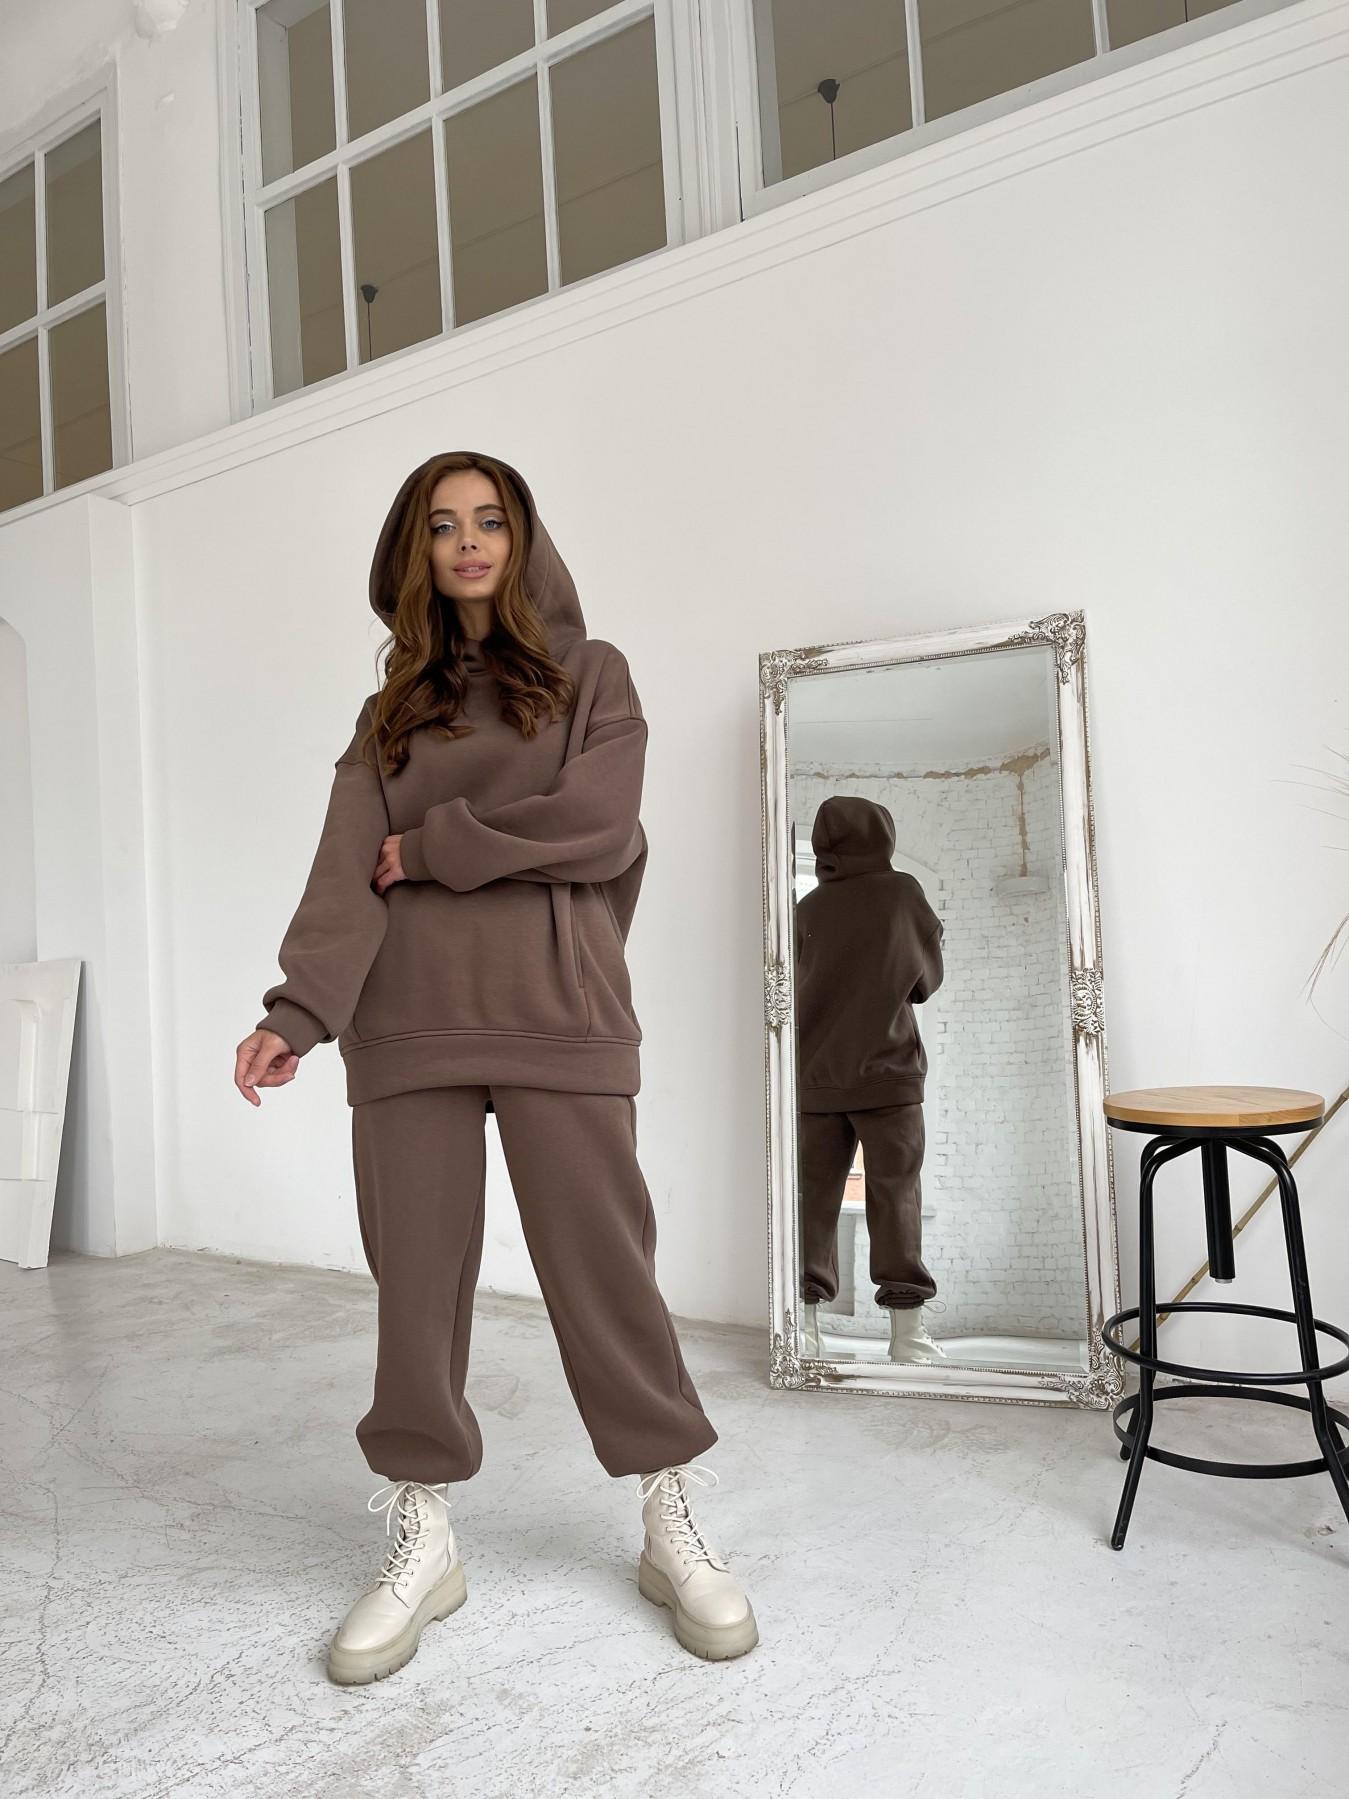 Марион утепленный костюм из трехнити 11852 АРТ. 48656 Цвет: Шоколад - фото 8, интернет магазин tm-modus.ru